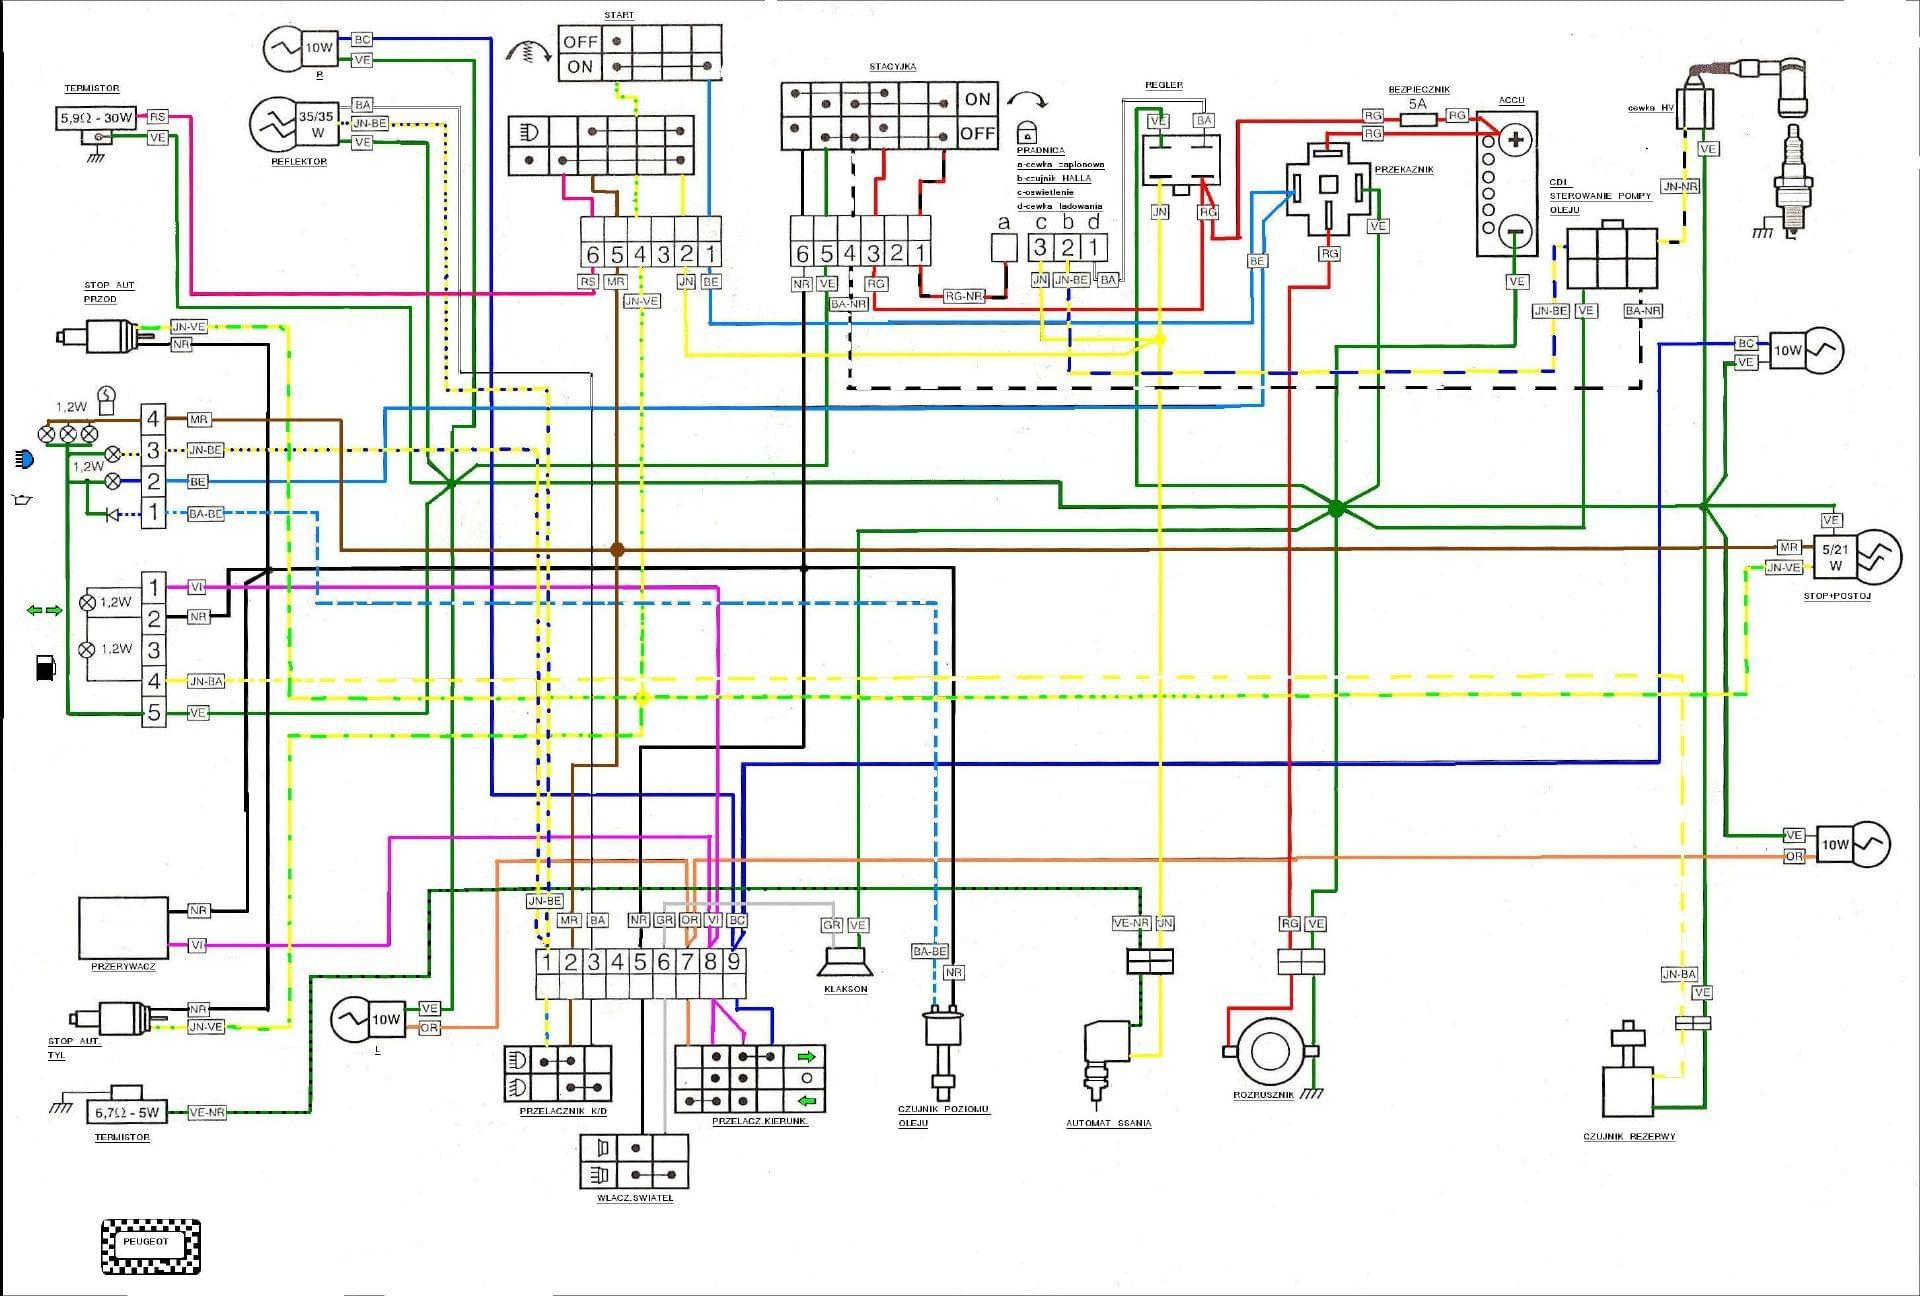 Amazing Peugeot Elyseo Schematiccar Wiring Diagram Basic Electronics Wiring Digital Resources Attrlexorcompassionincorg